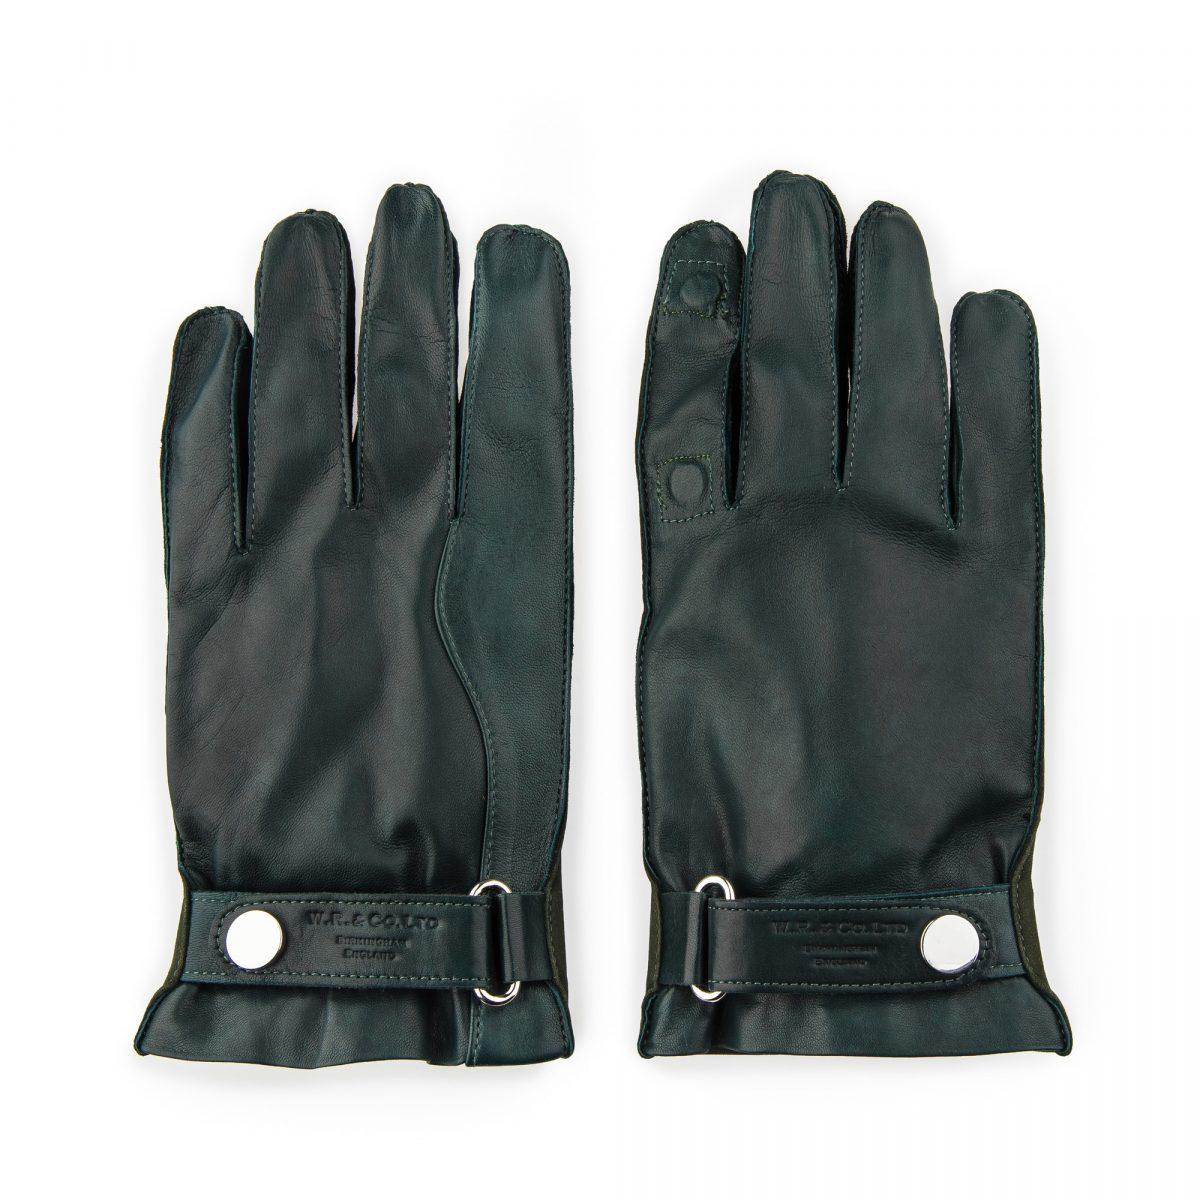 wr_co_premium_shooting_gloves-152-edit